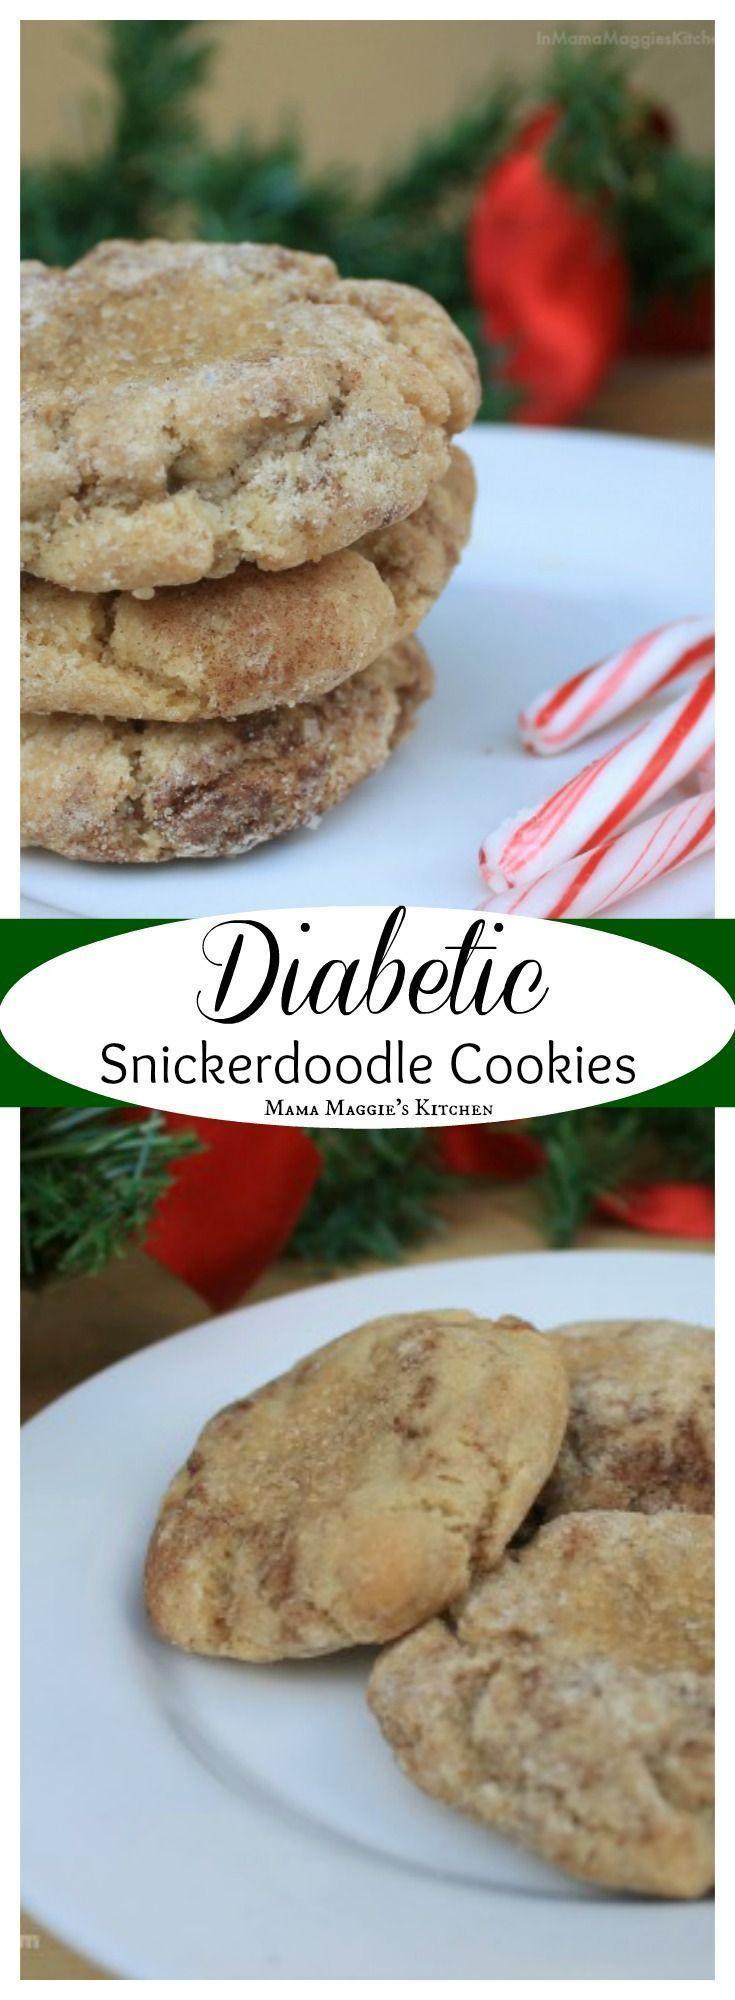 Low Carb Recipes For Diabetics  The 25 best Diabetic desserts ideas on Pinterest